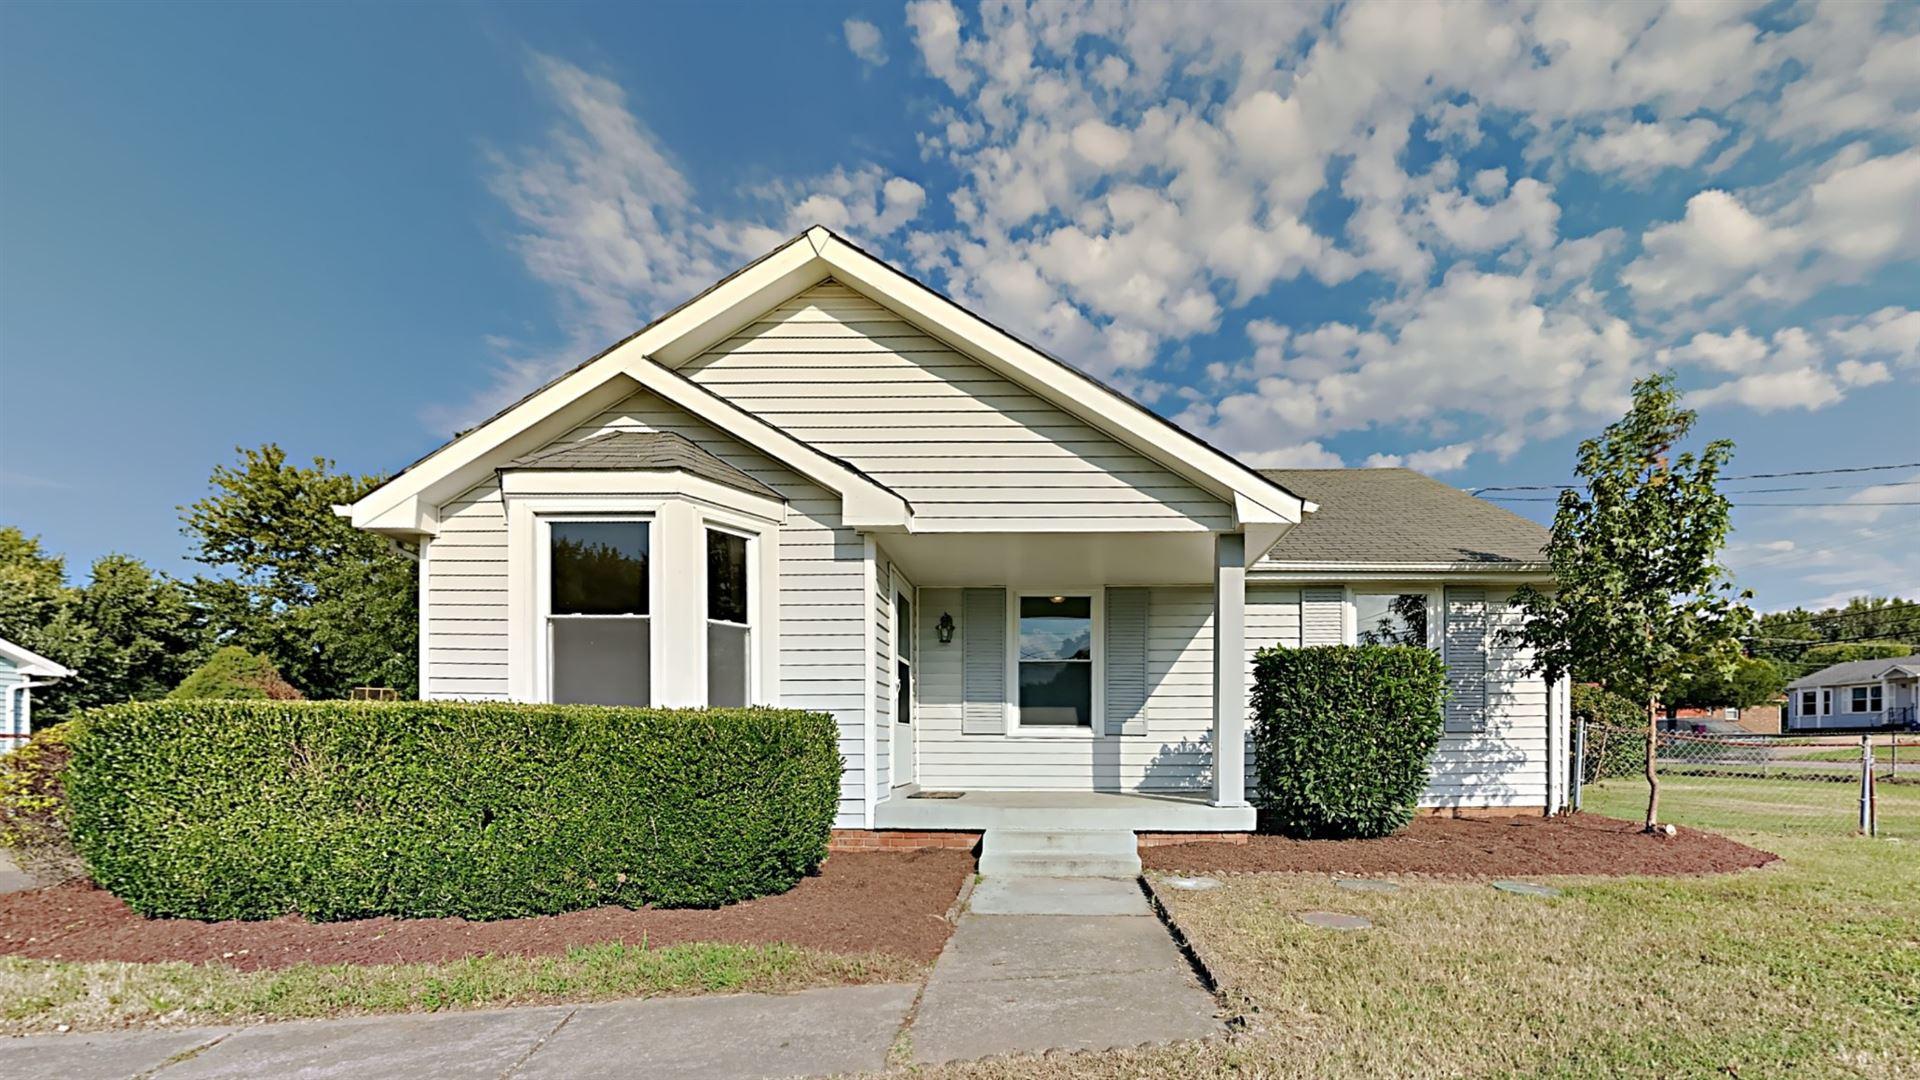 591 Anita Dr, Clarksville, TN 37042 - MLS#: 2289978